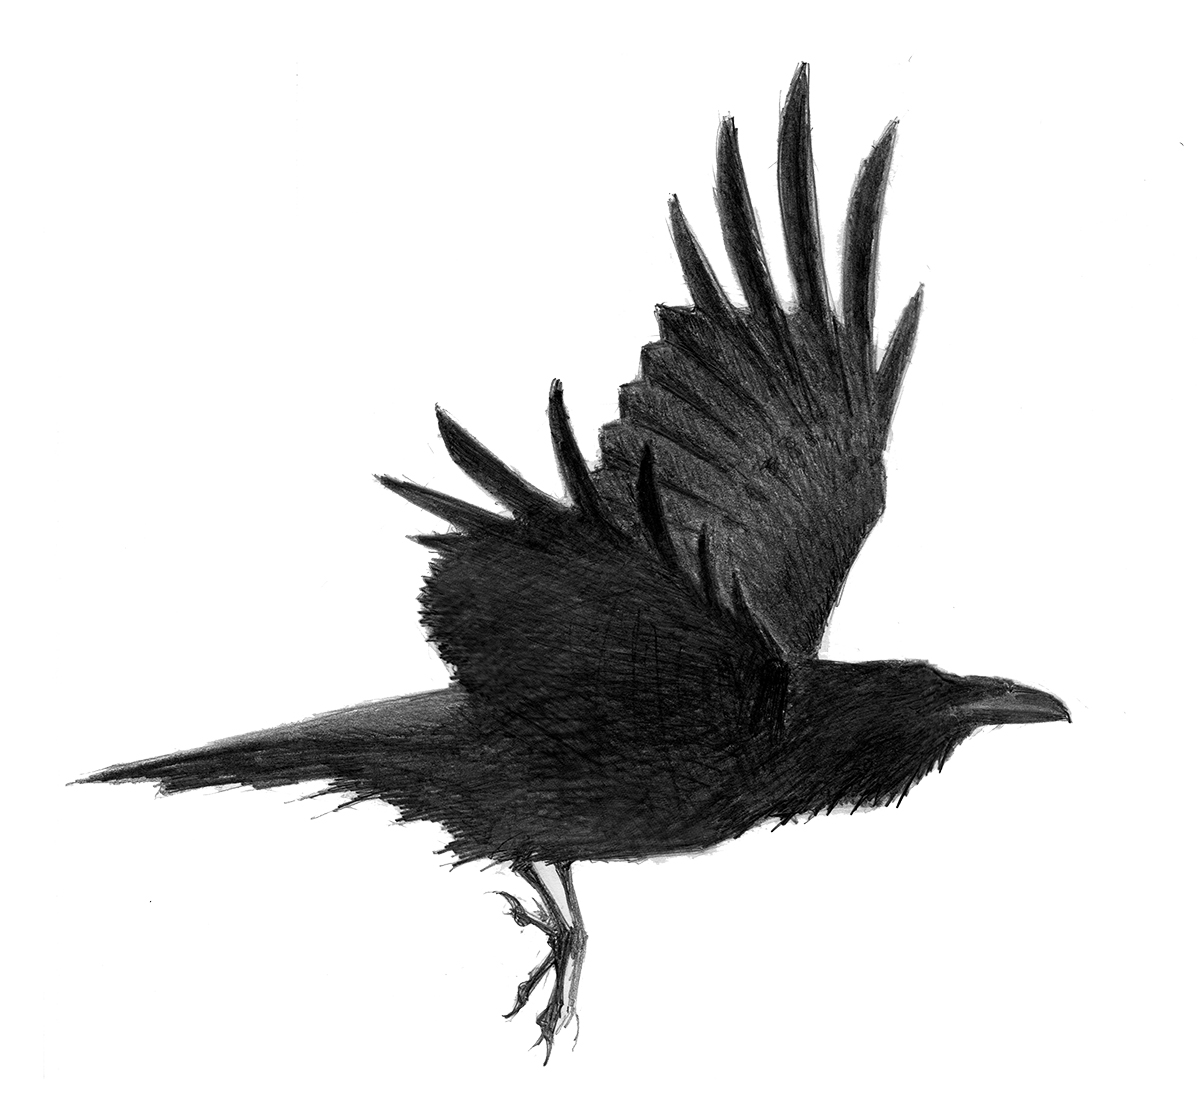 Drawn raven common raven 3 Common Raven flight</b> Raven